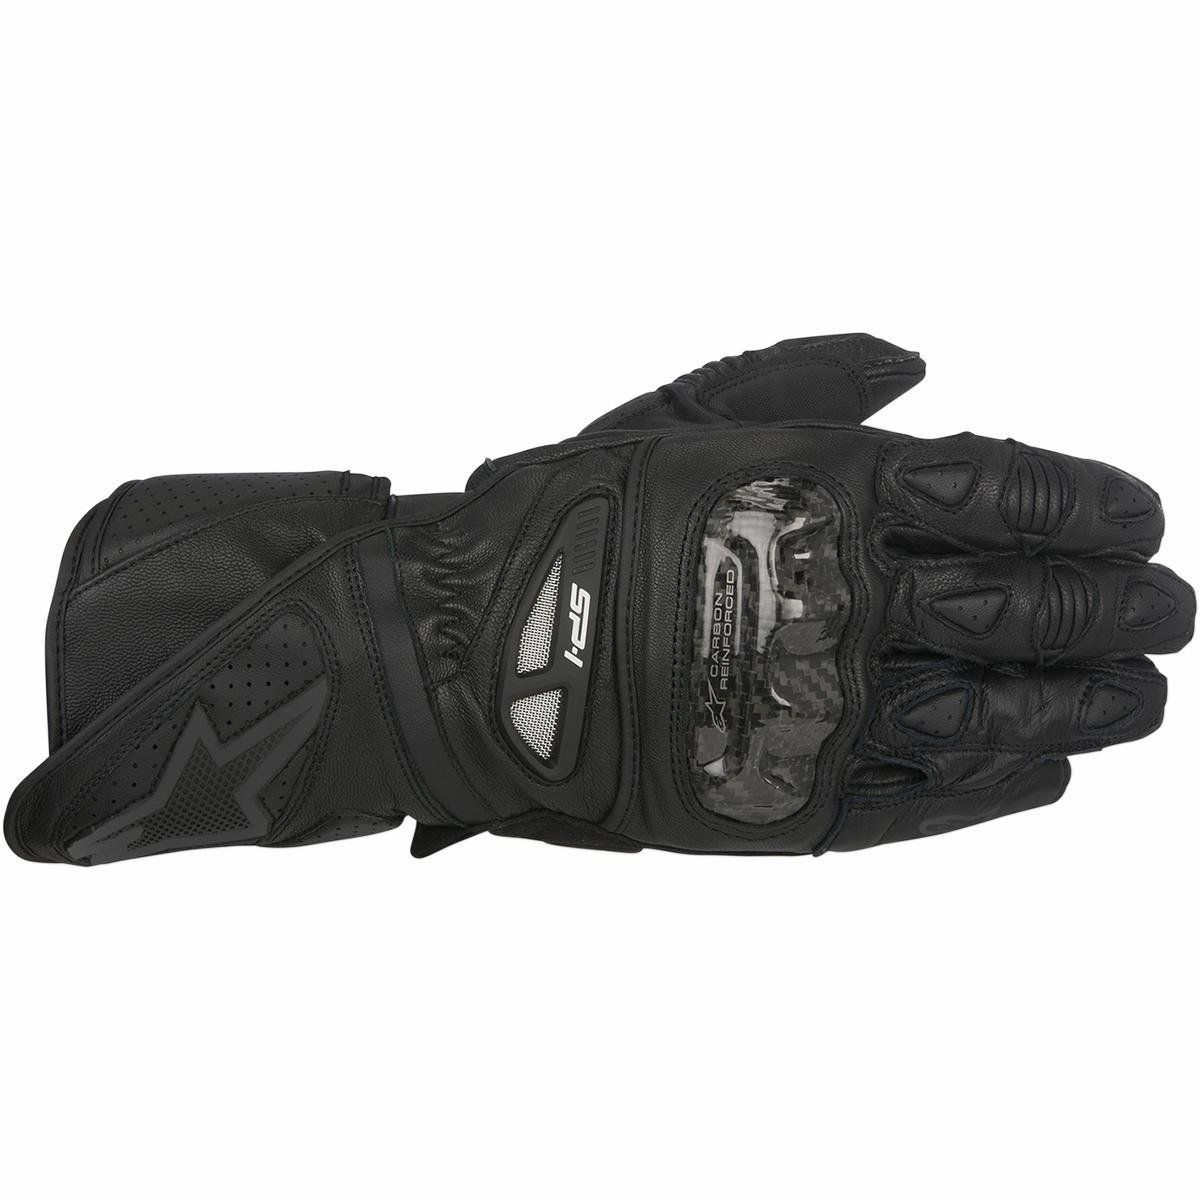 Black, X-Large Joe Rocket Vento Mens Fingerless Motorcycle Riding Gloves